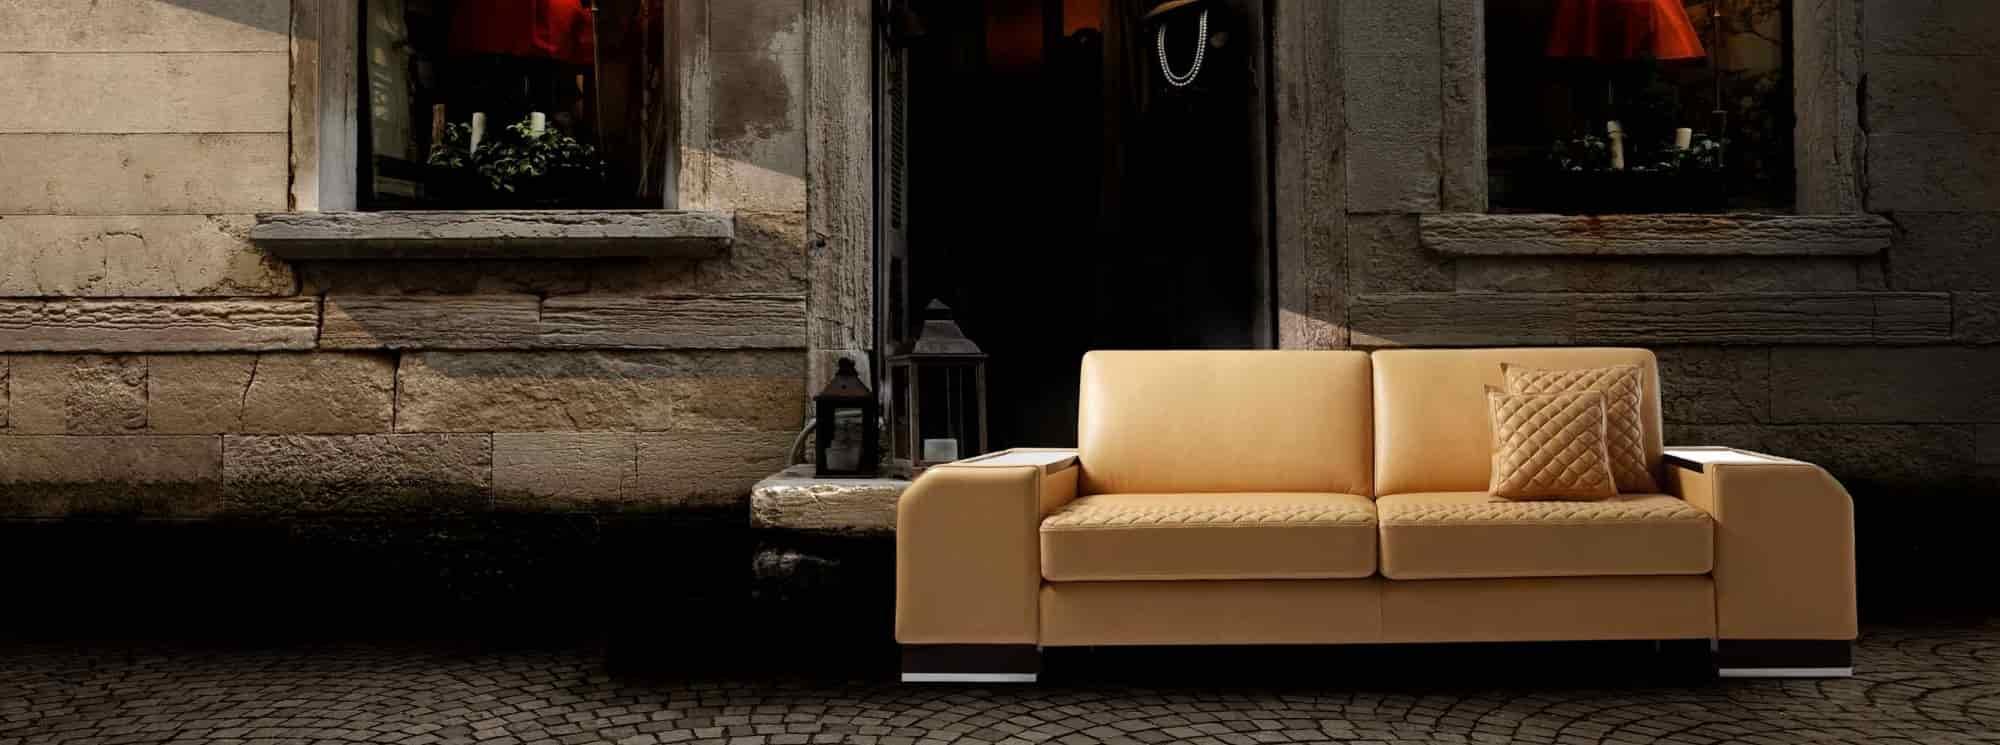 international trading co, harni - furniture dealers in vadodara